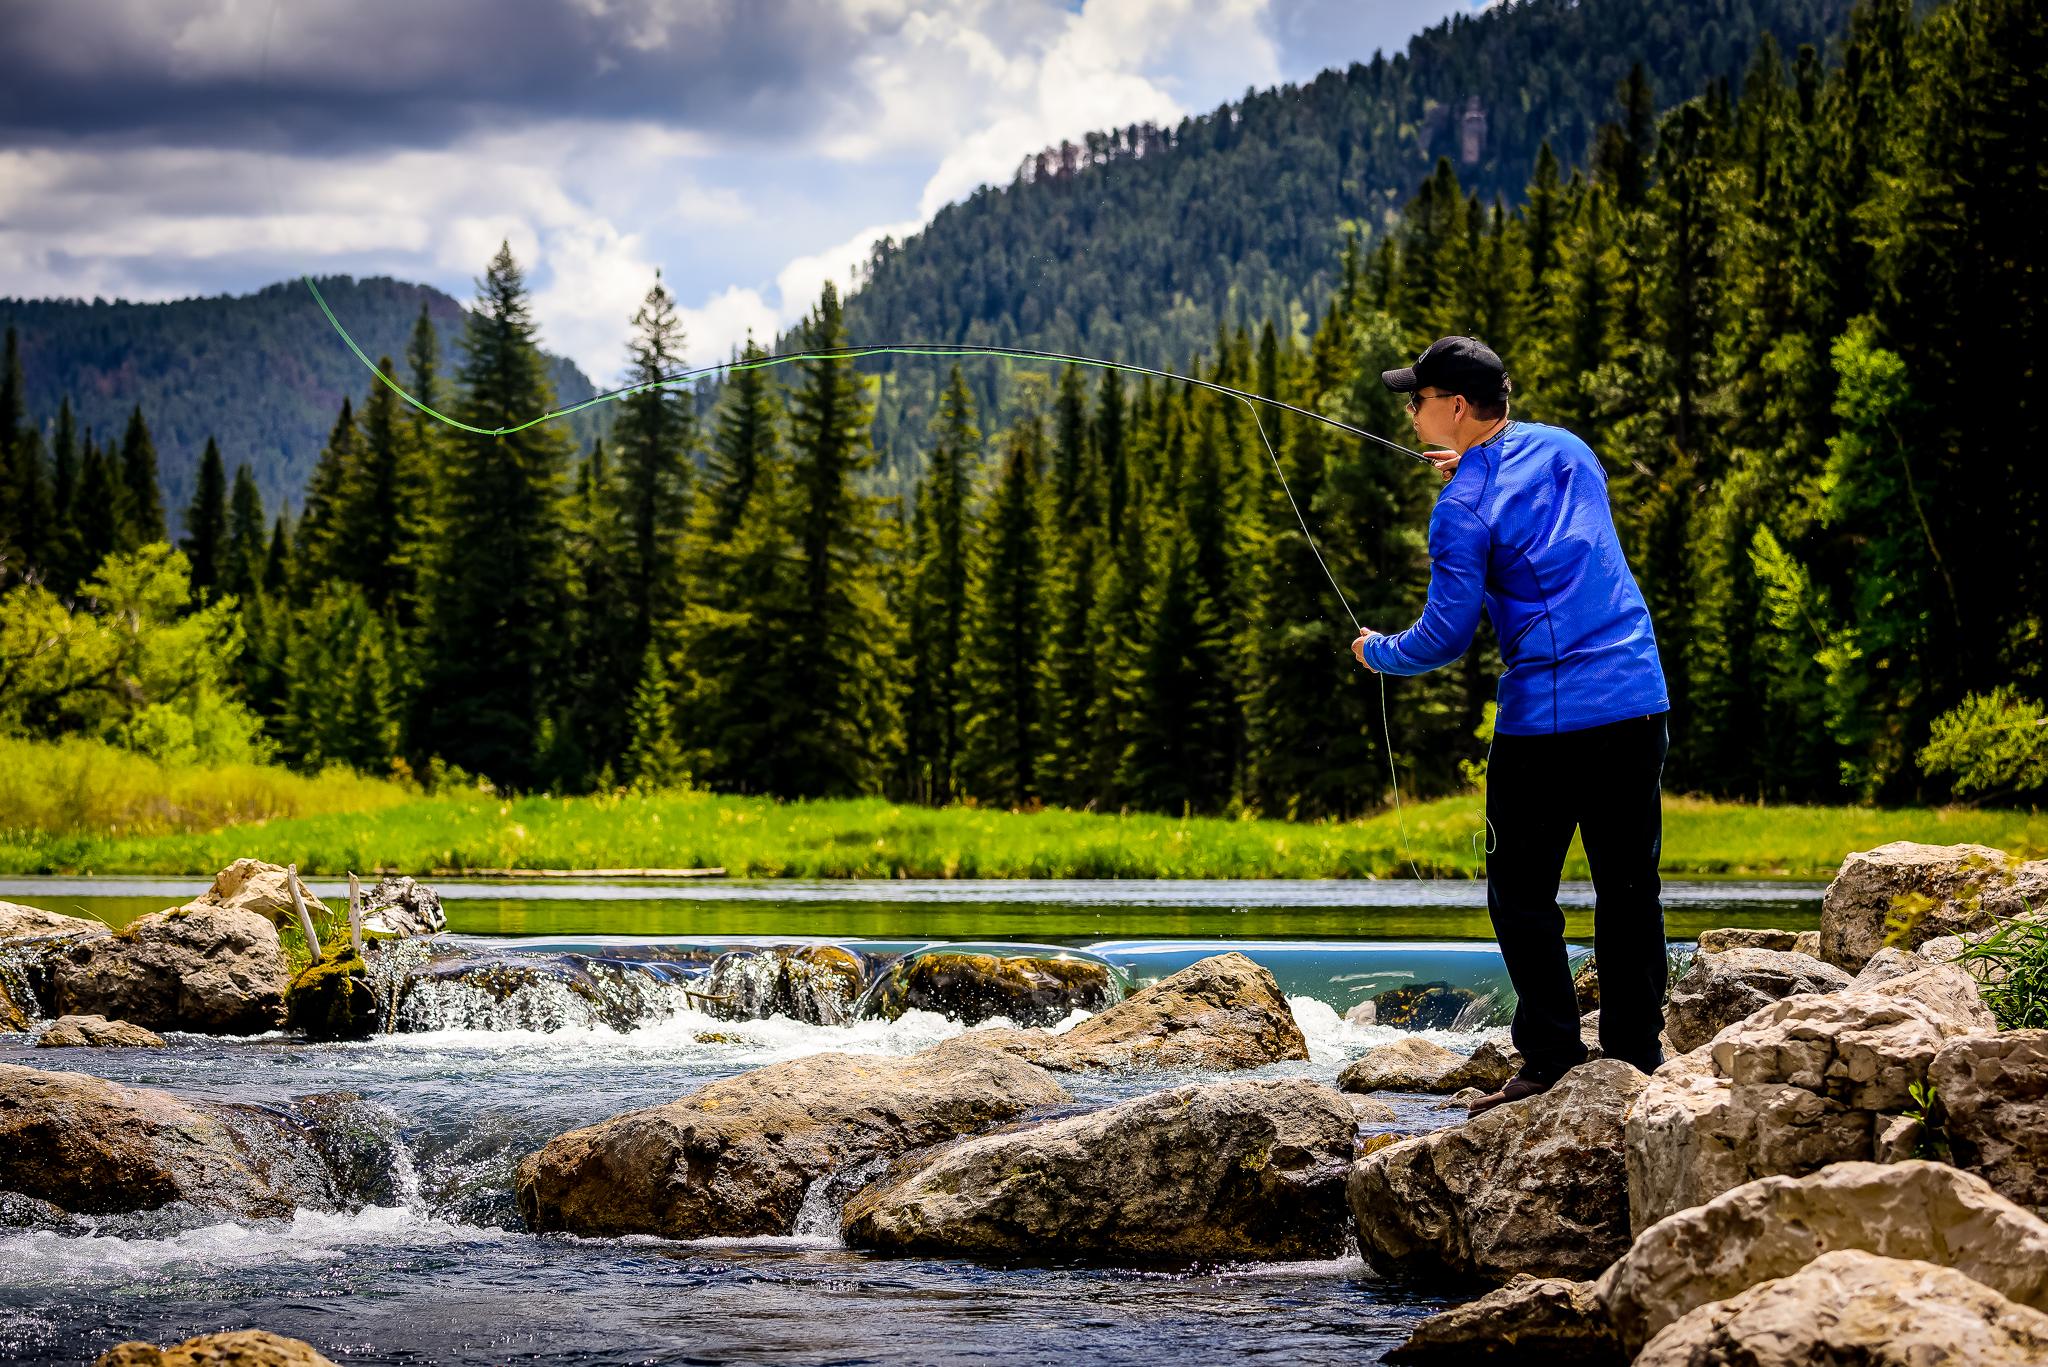 Fishing & Ice Fishing   Black Hills & Badlands - South Dakota